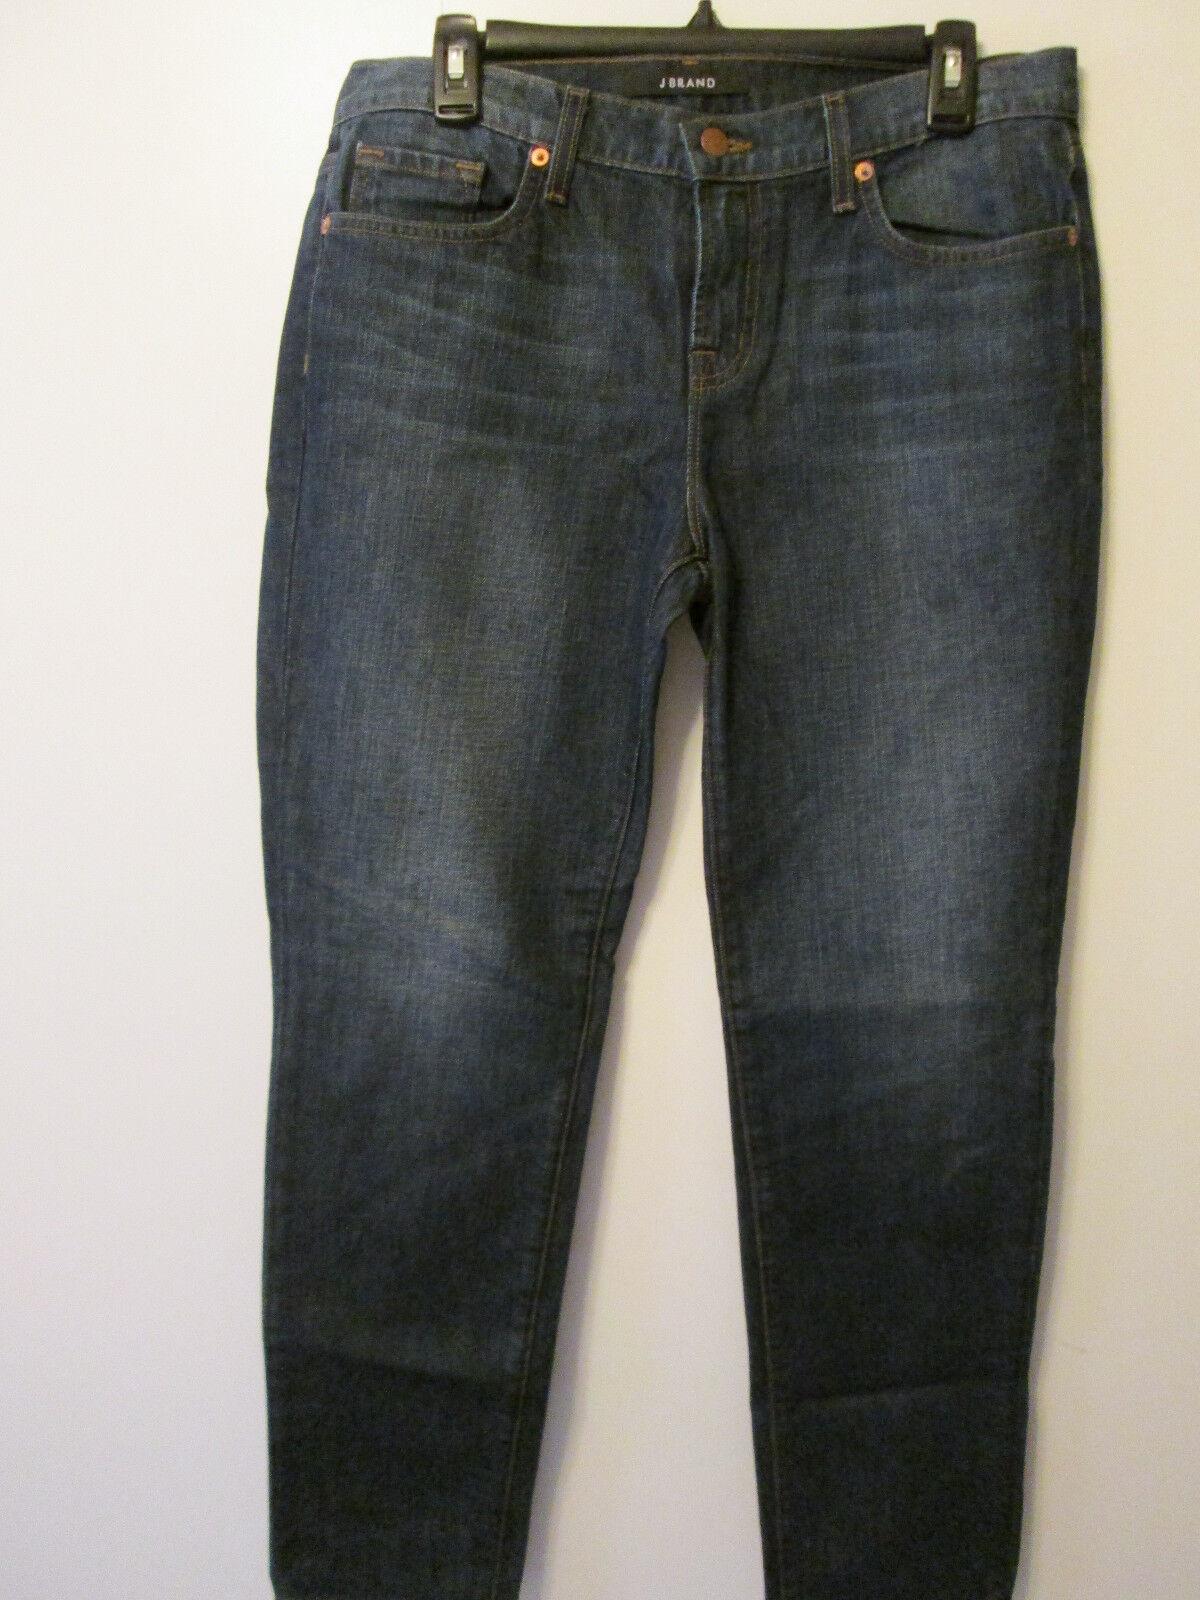 J Brand Jeans Aidan Ringer Slouchy Boy Jean Dark Wash Ankle Length Sz 28 NWT